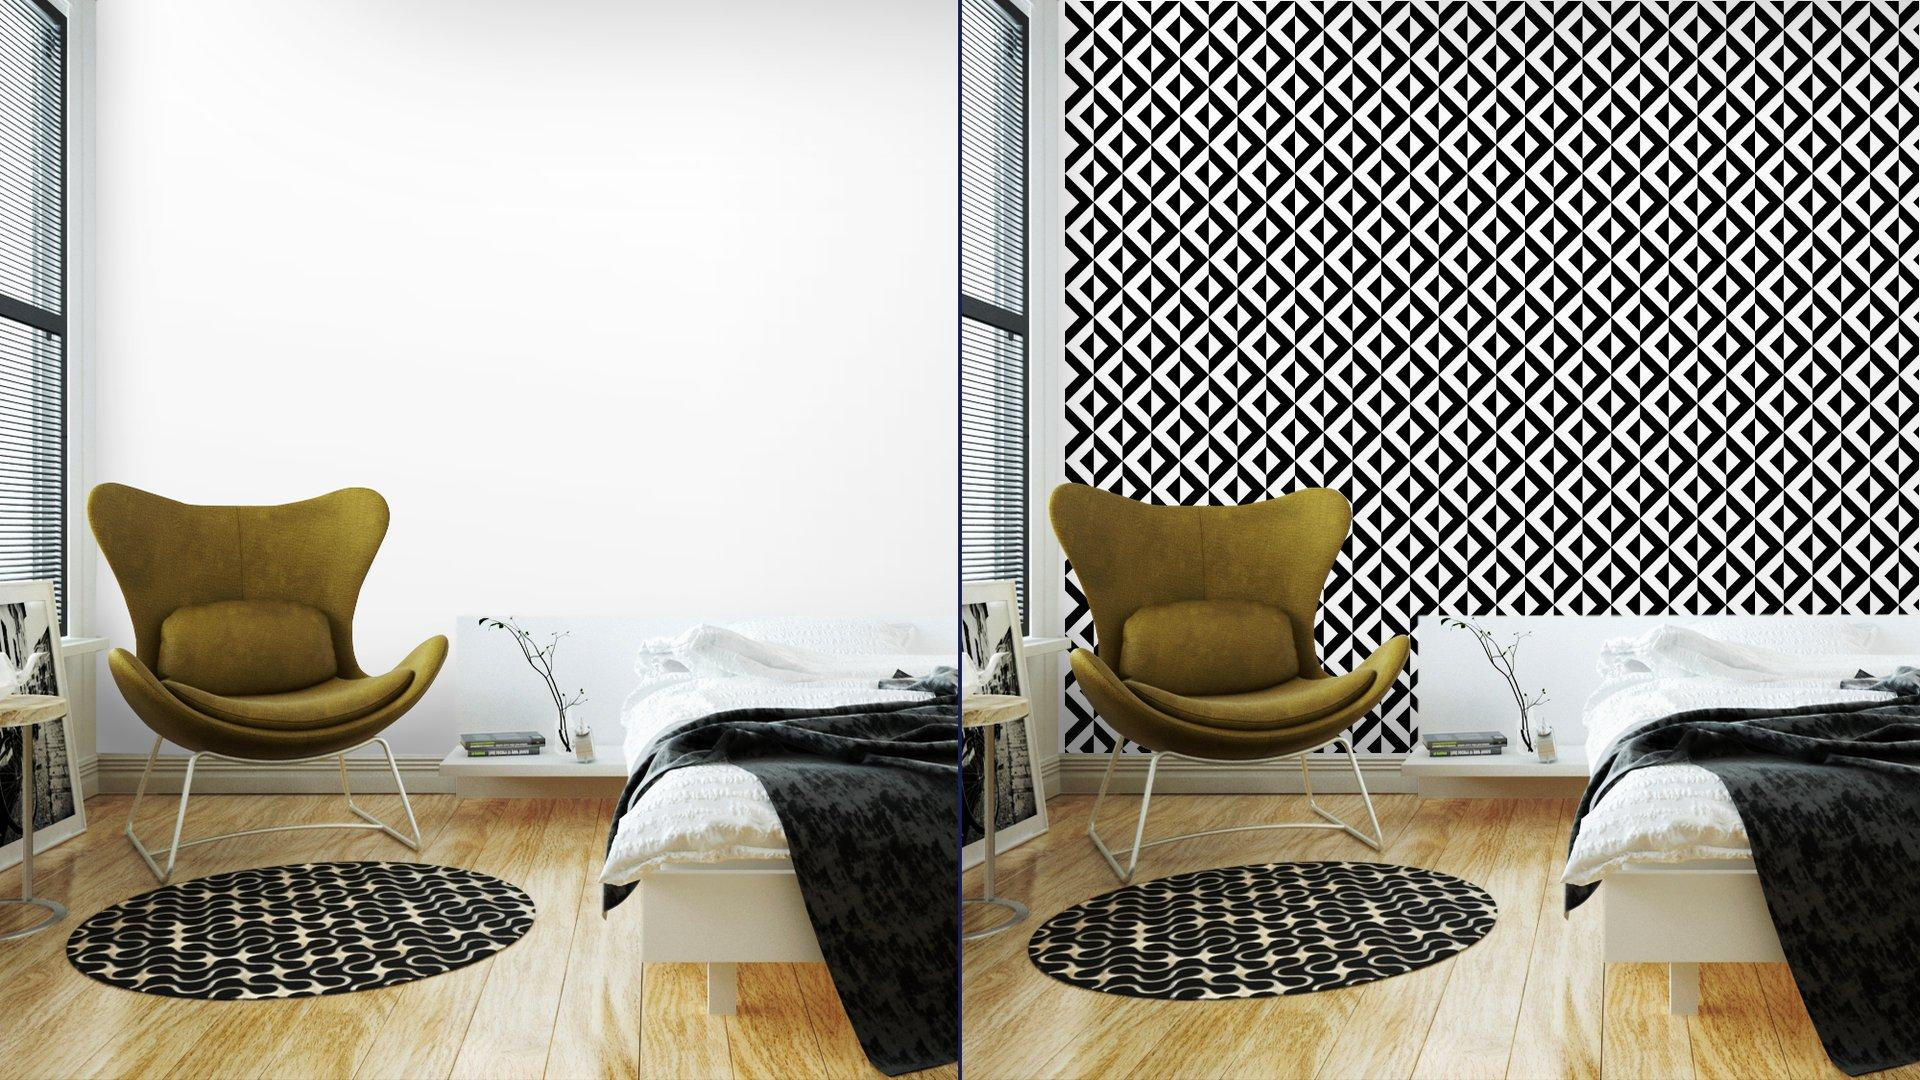 Fotomurales mexico papeles pintados patron geometrico abstracto 2 - Papel Tapiz Geométrico Blanco y Negro 01